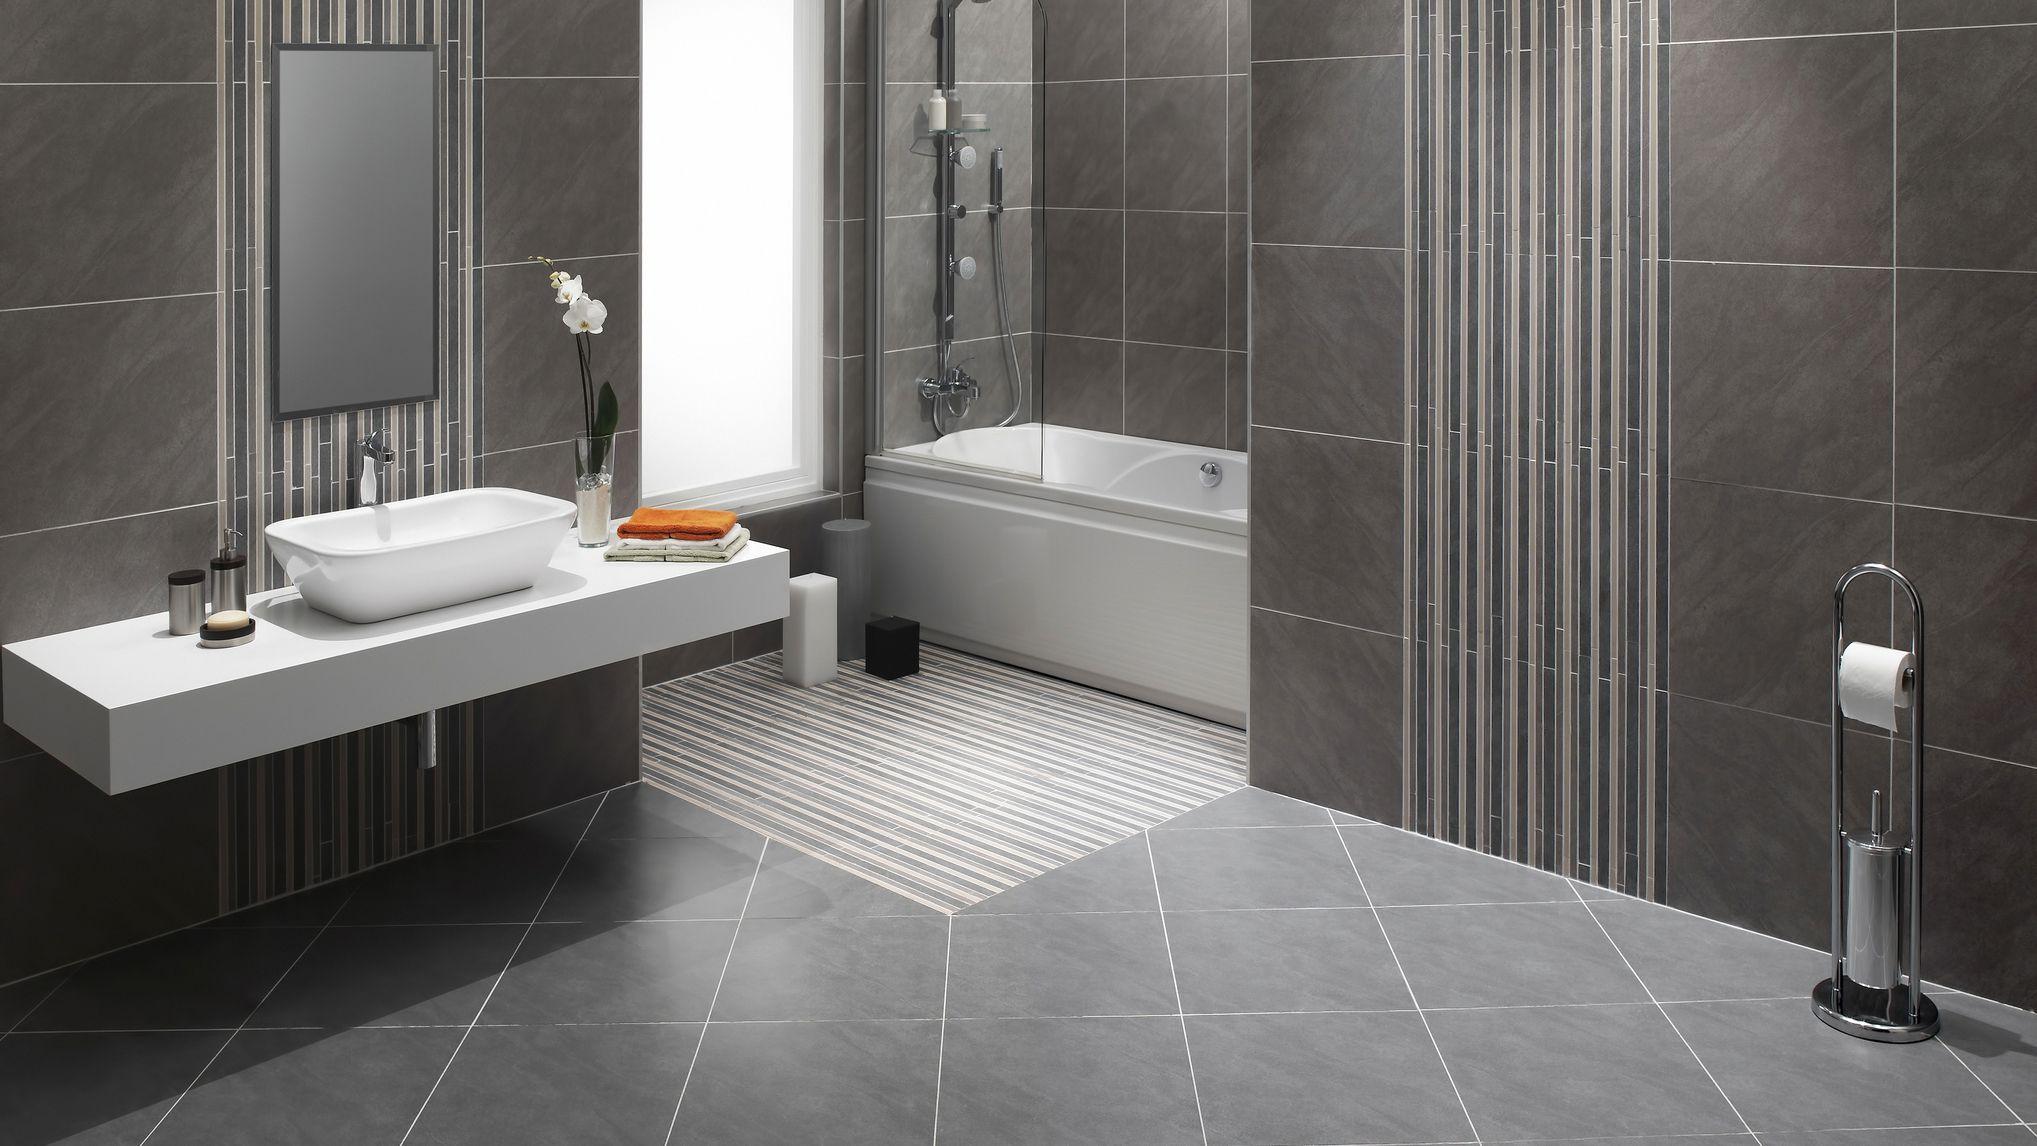 Advantages Of A Diagonal Tile Layout For Bathroom Floor